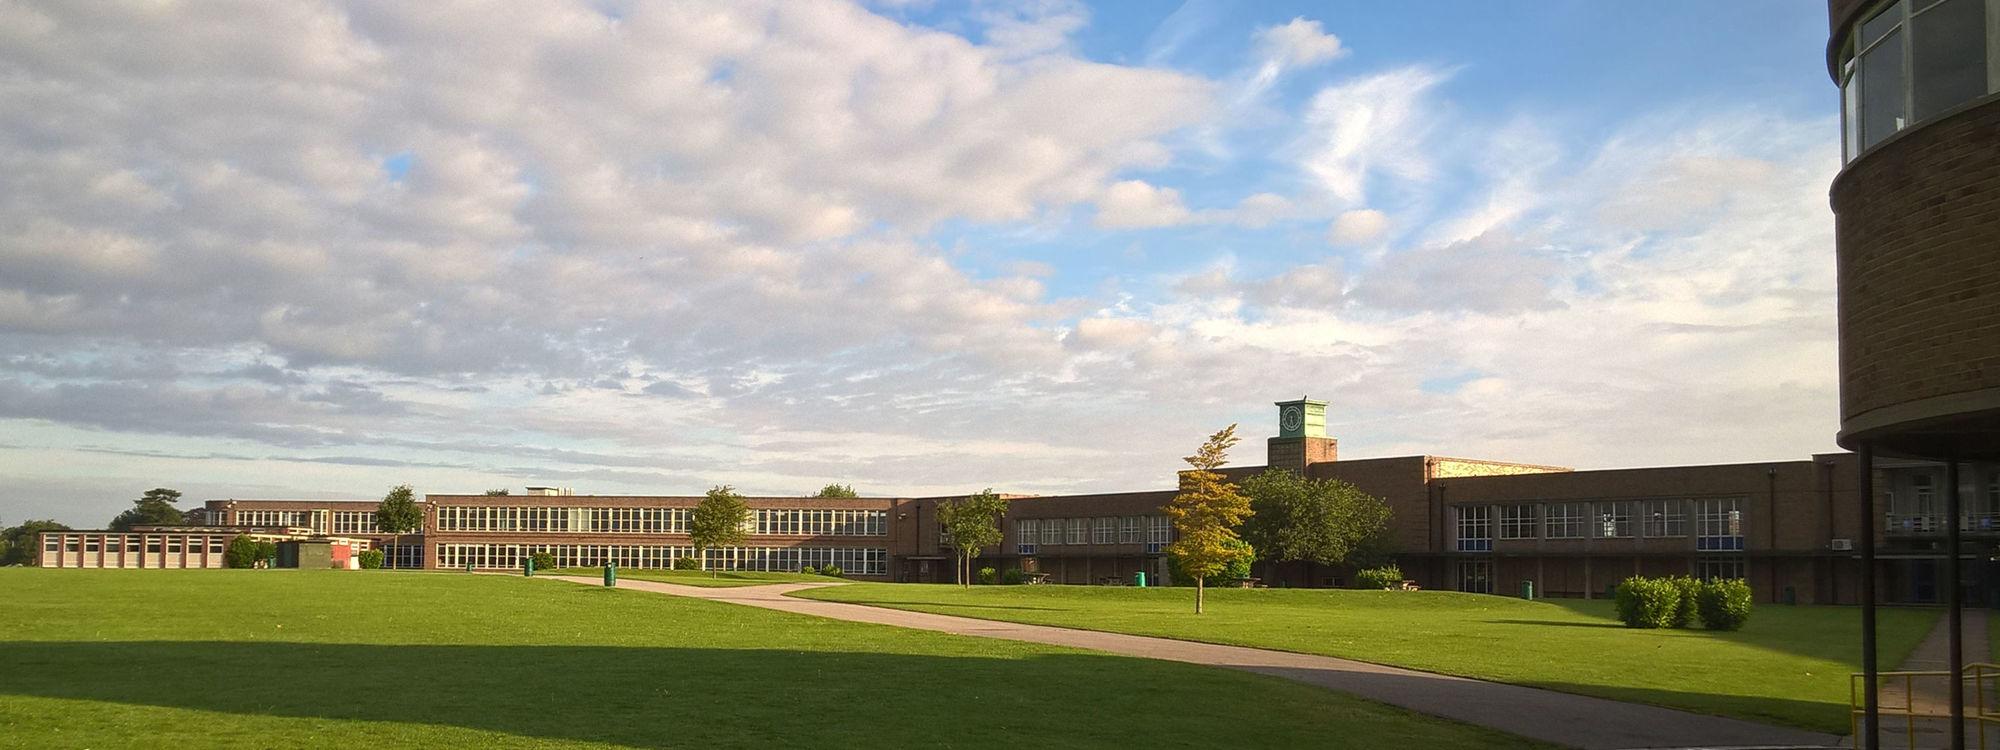 Hewett academy 8